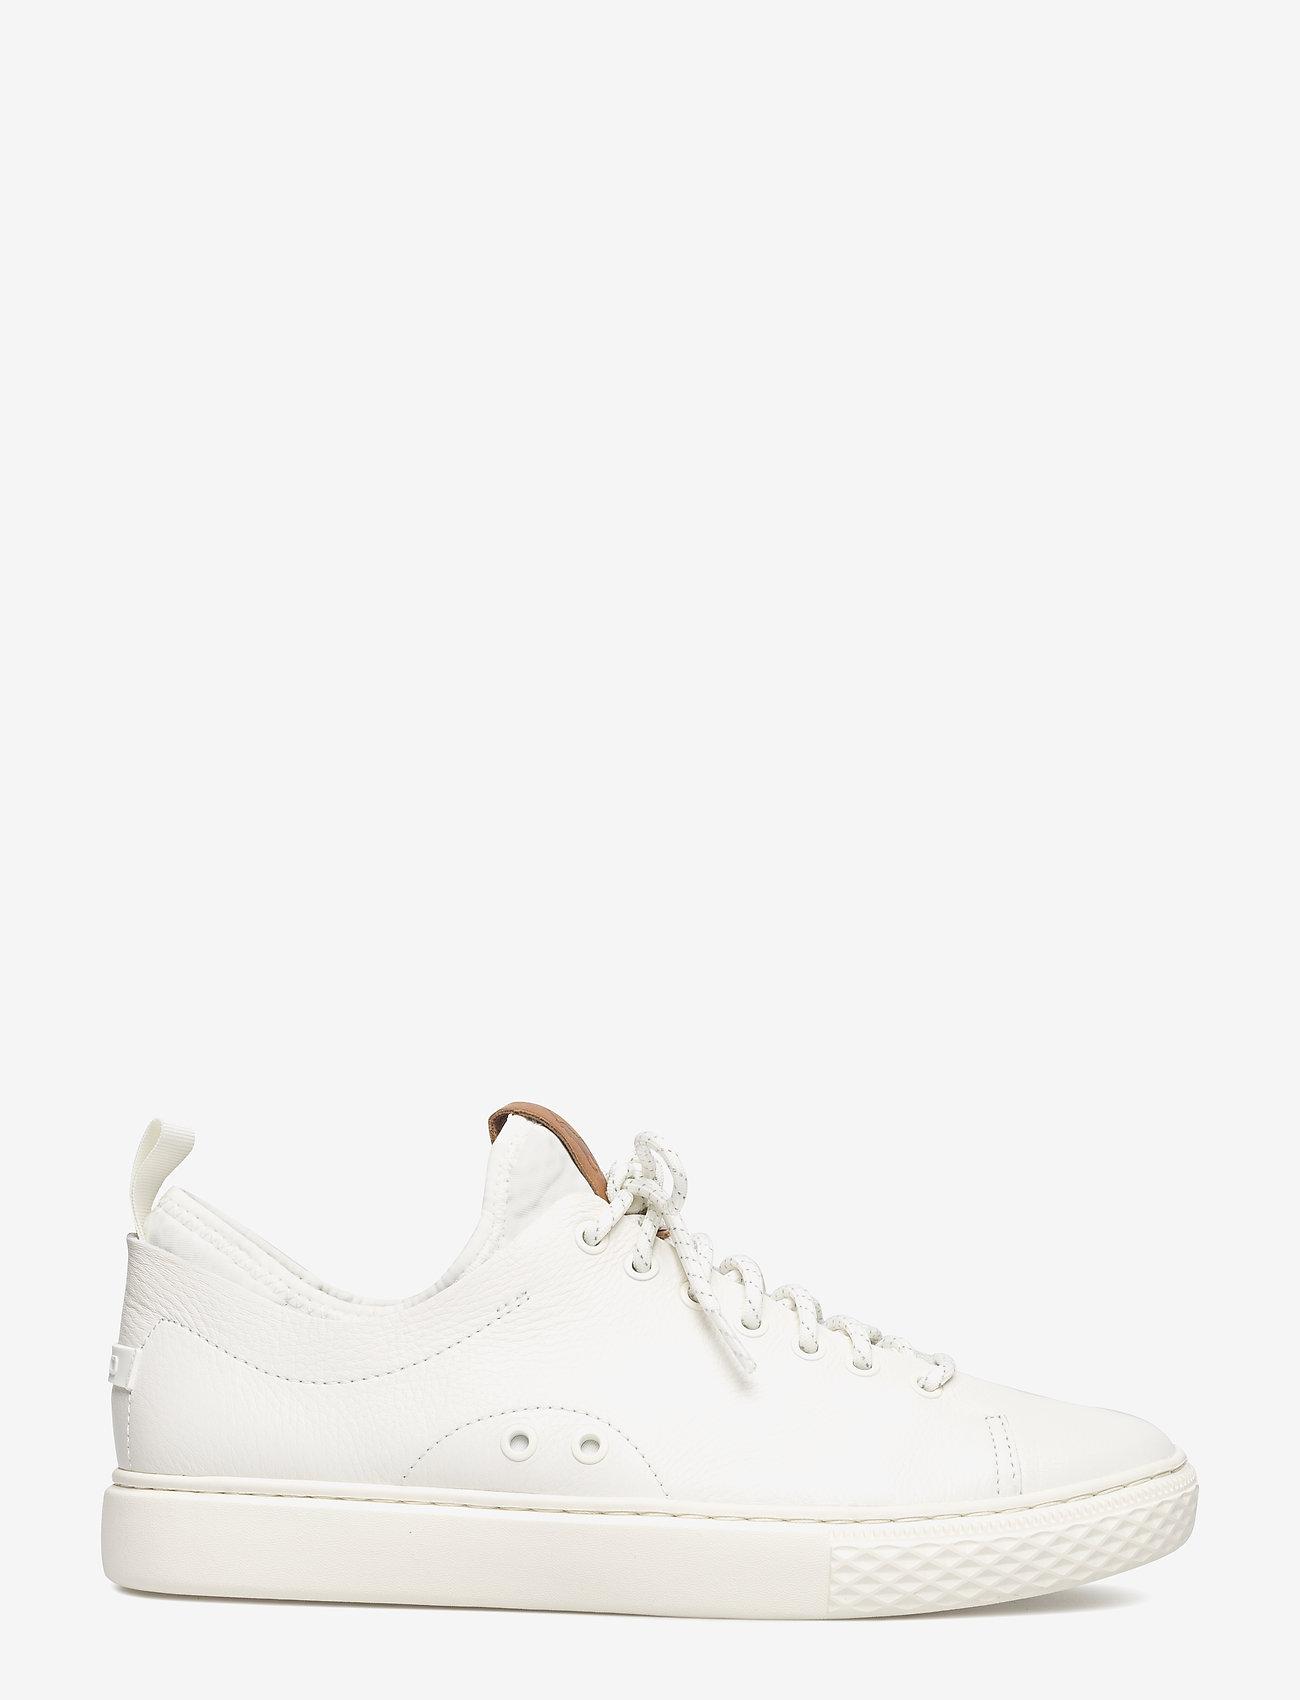 Polo Ralph Lauren Dunovin Leather Sneaker - Sneakers WHITE - Schuhe Billige